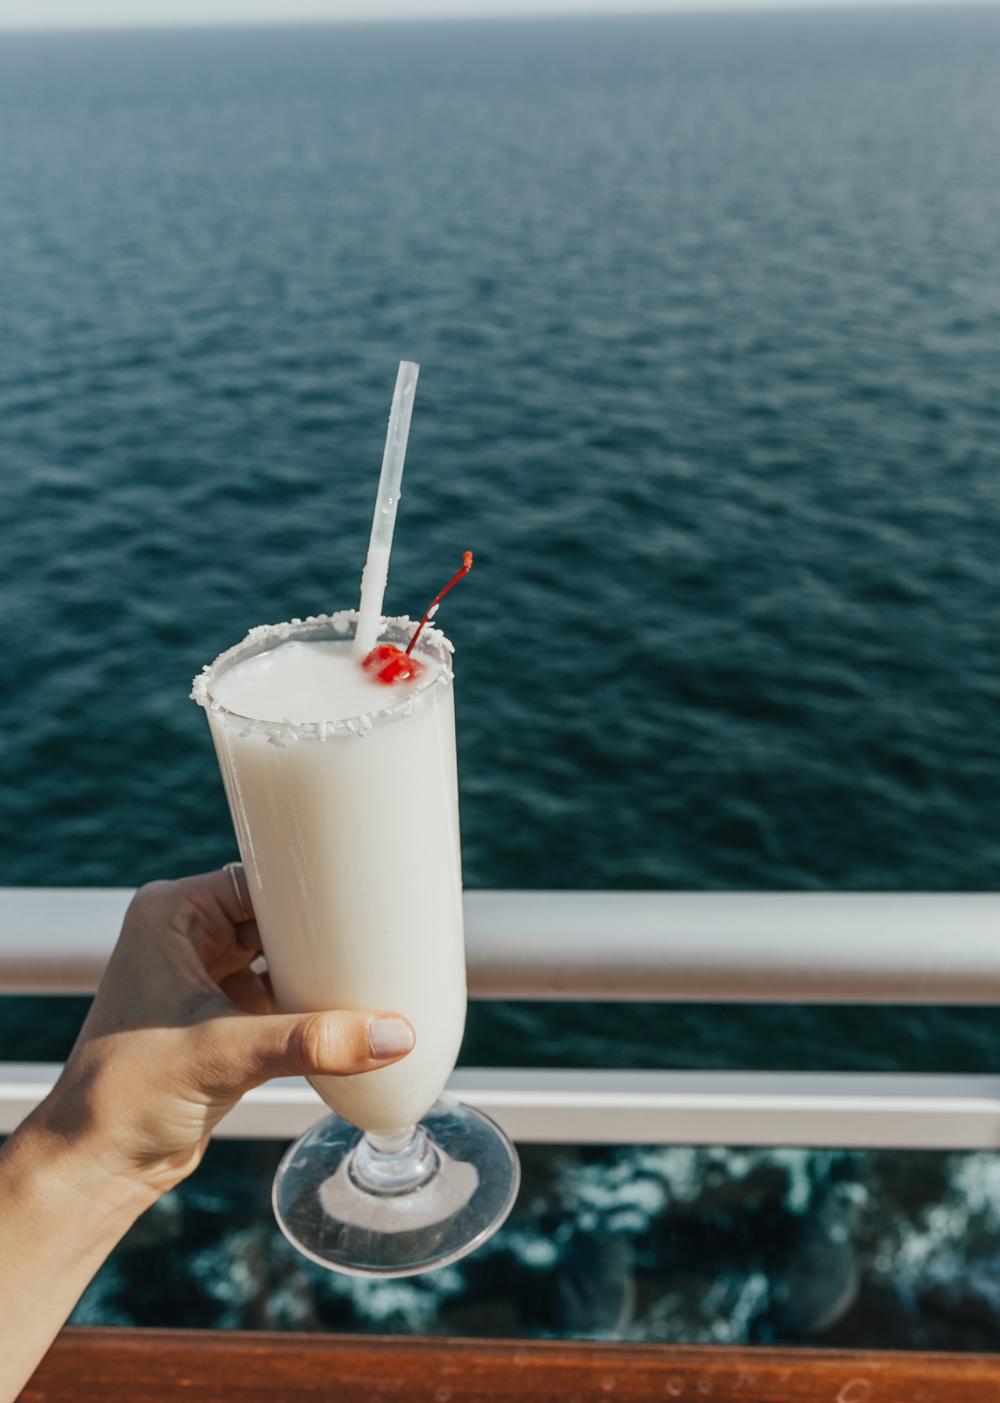 livvyland-blog-olivia-watson-travel-fashion-blogger-princess-cruises-regal-ship-what-to-do-on-board-cruise-boat-pina-colada-sea-balcony